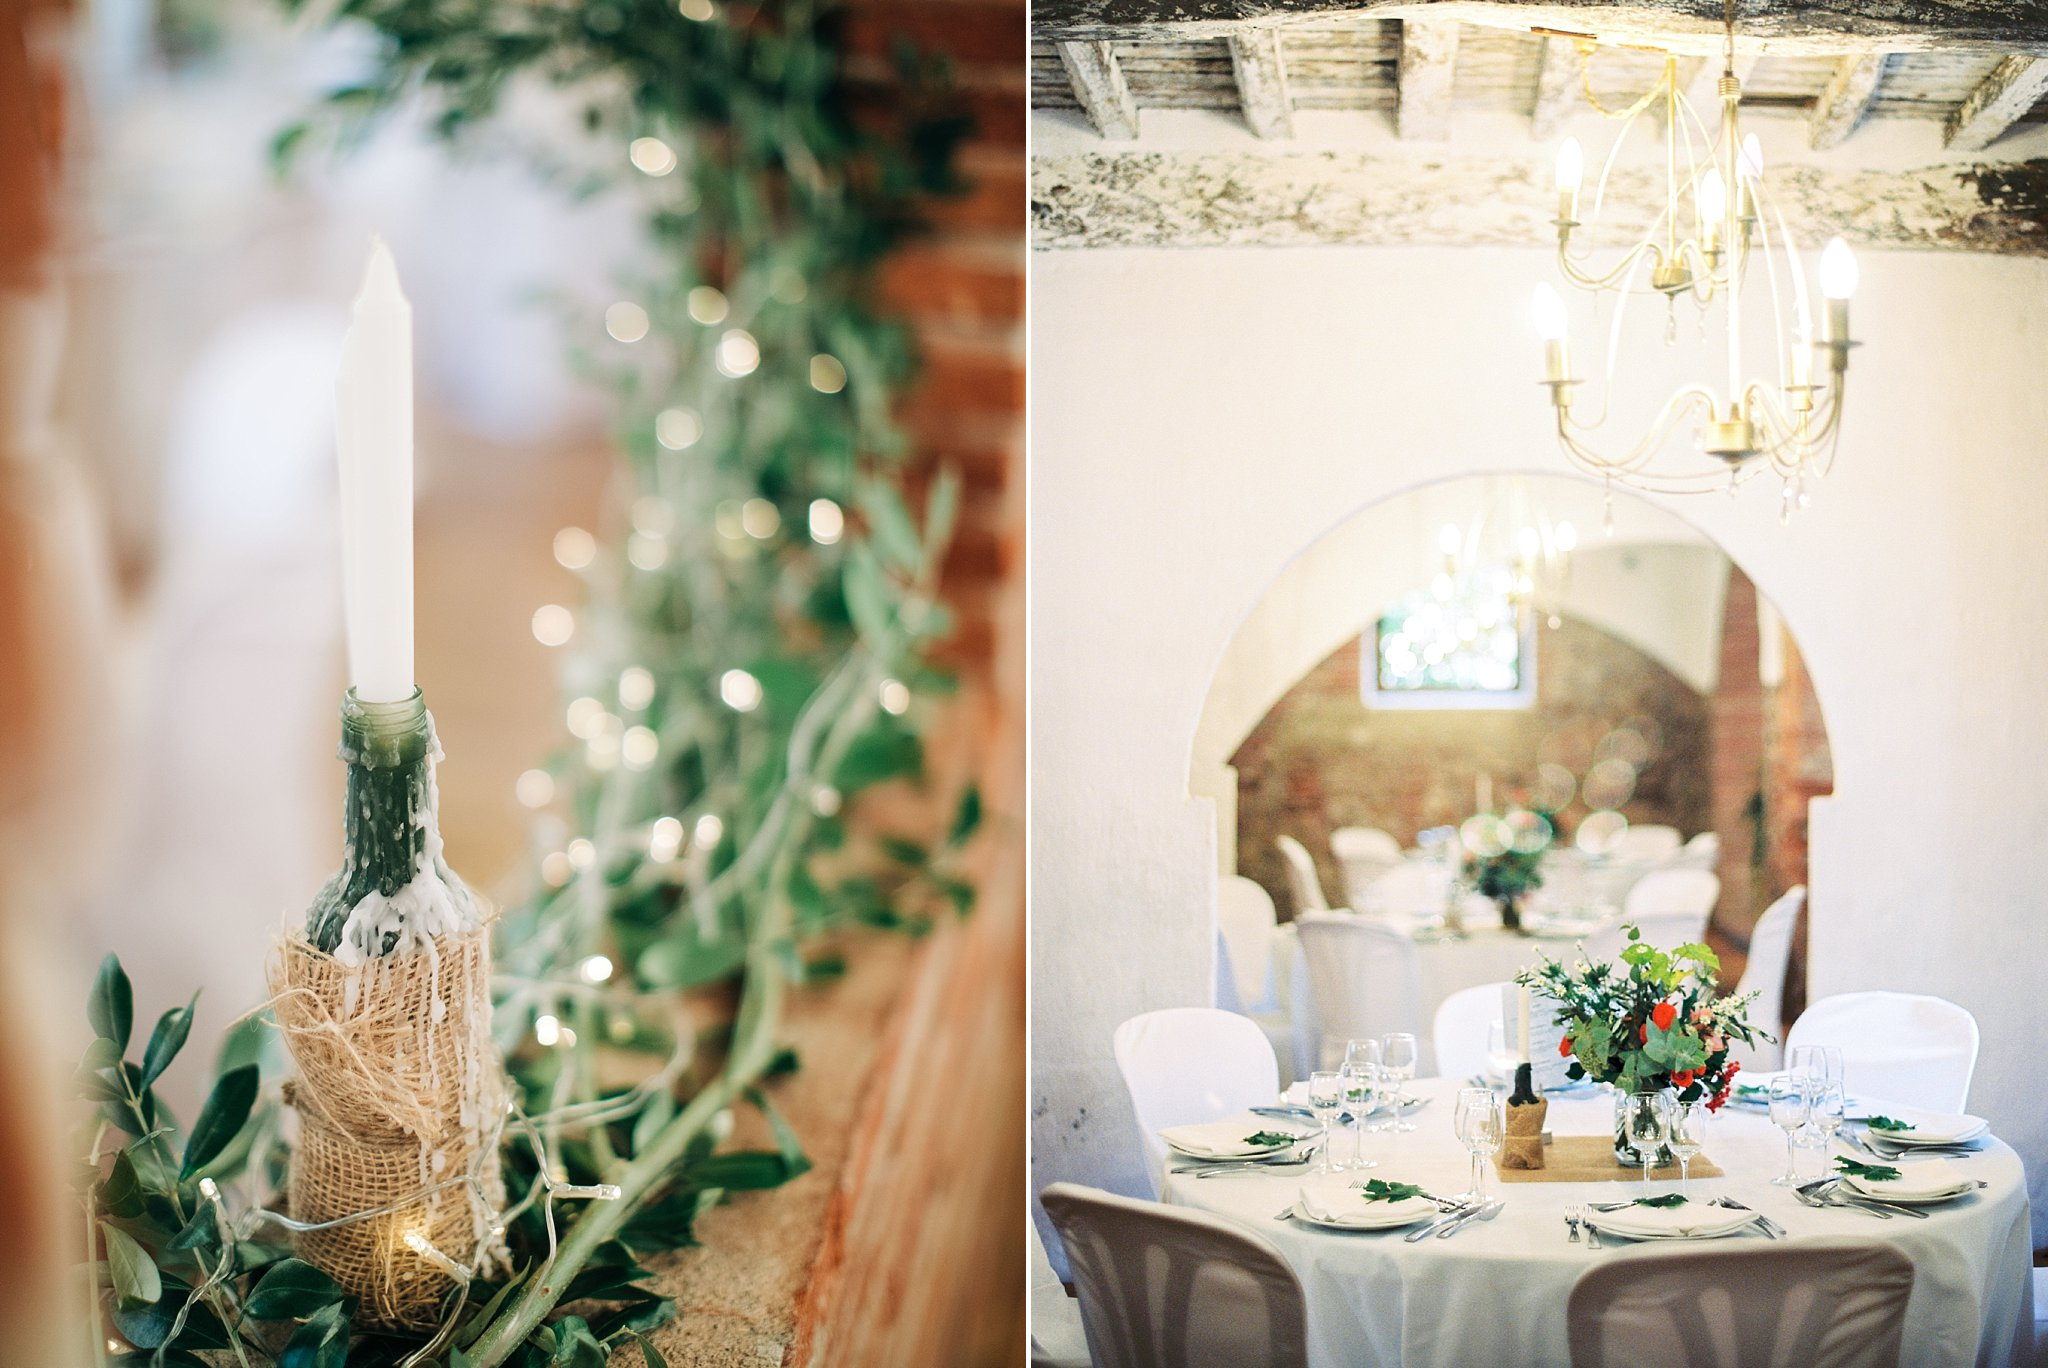 Wedding Photographer Perpignan - Château Las Collas Wedding - Hugo Hennequin058.jpg